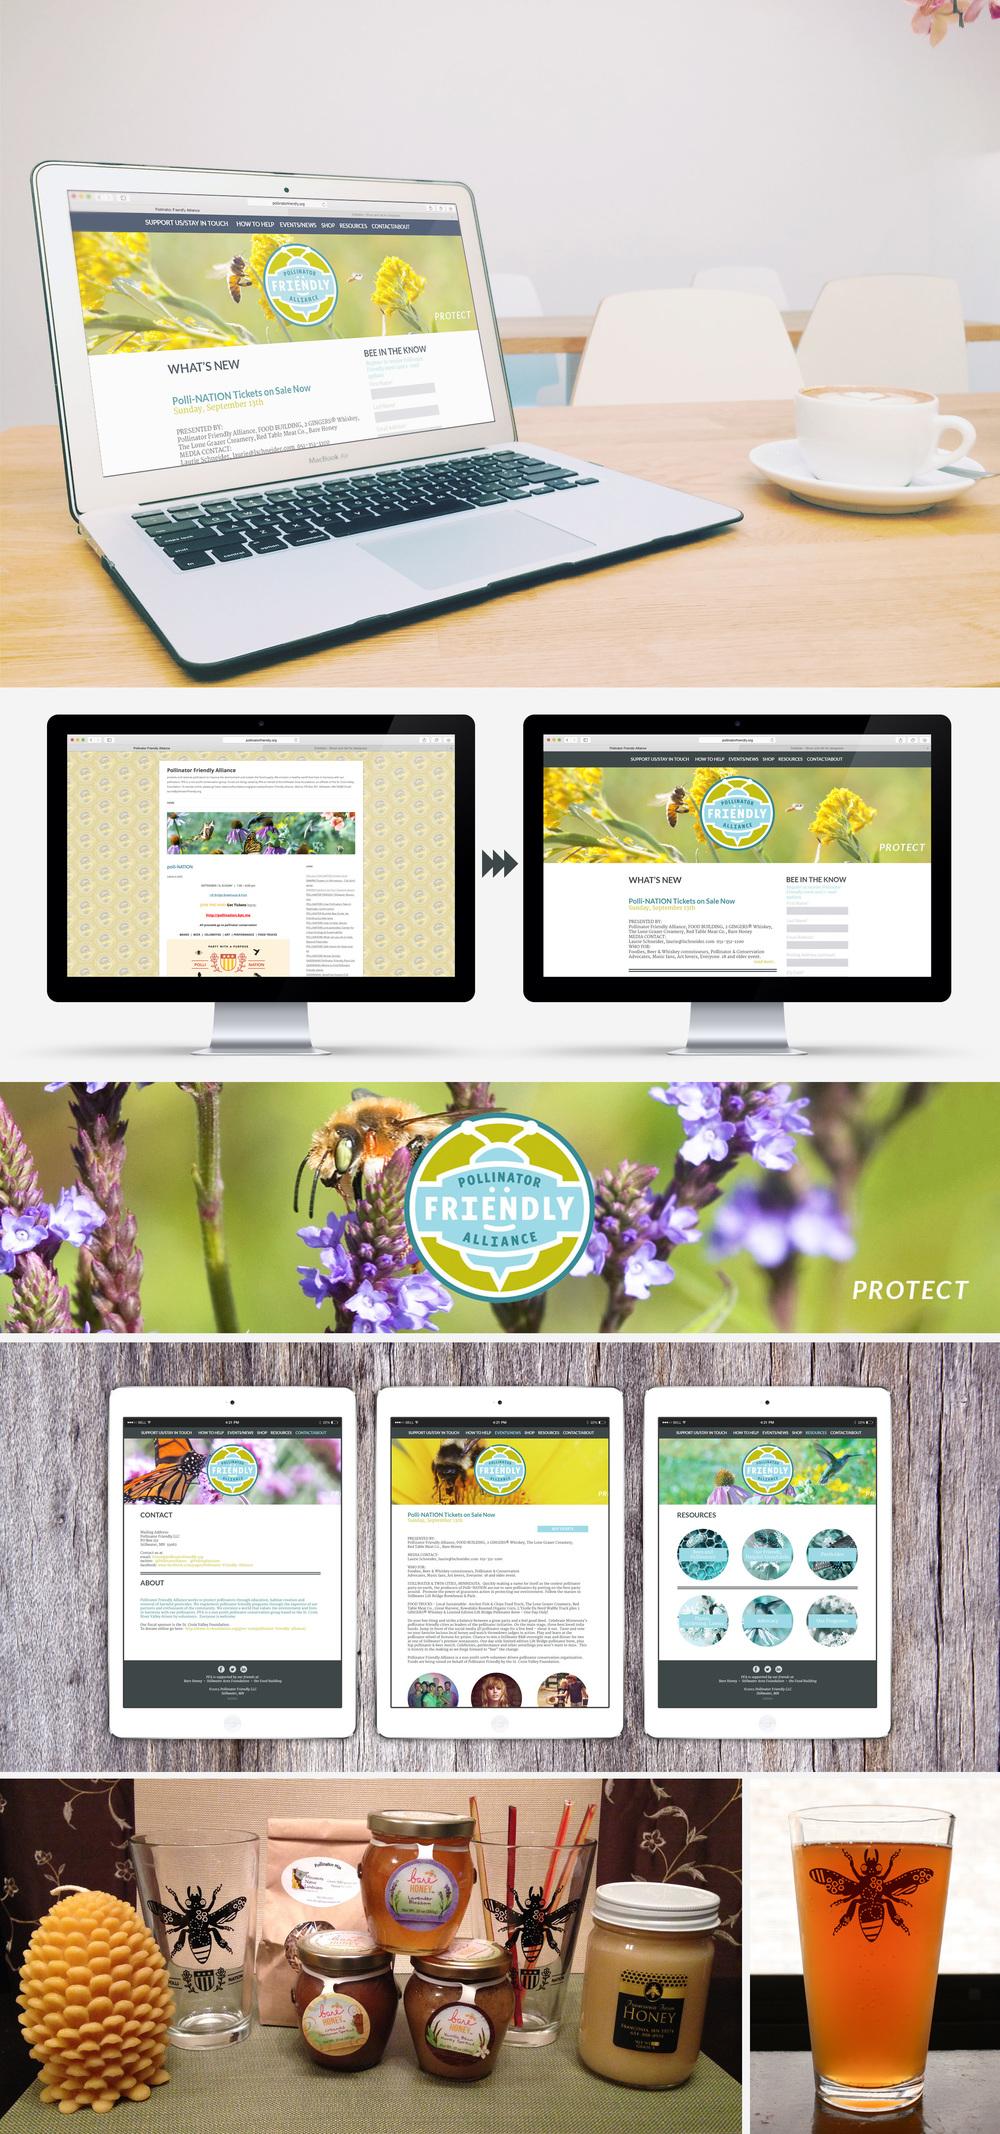 PollinatorFriendly_Portfolio.jpg